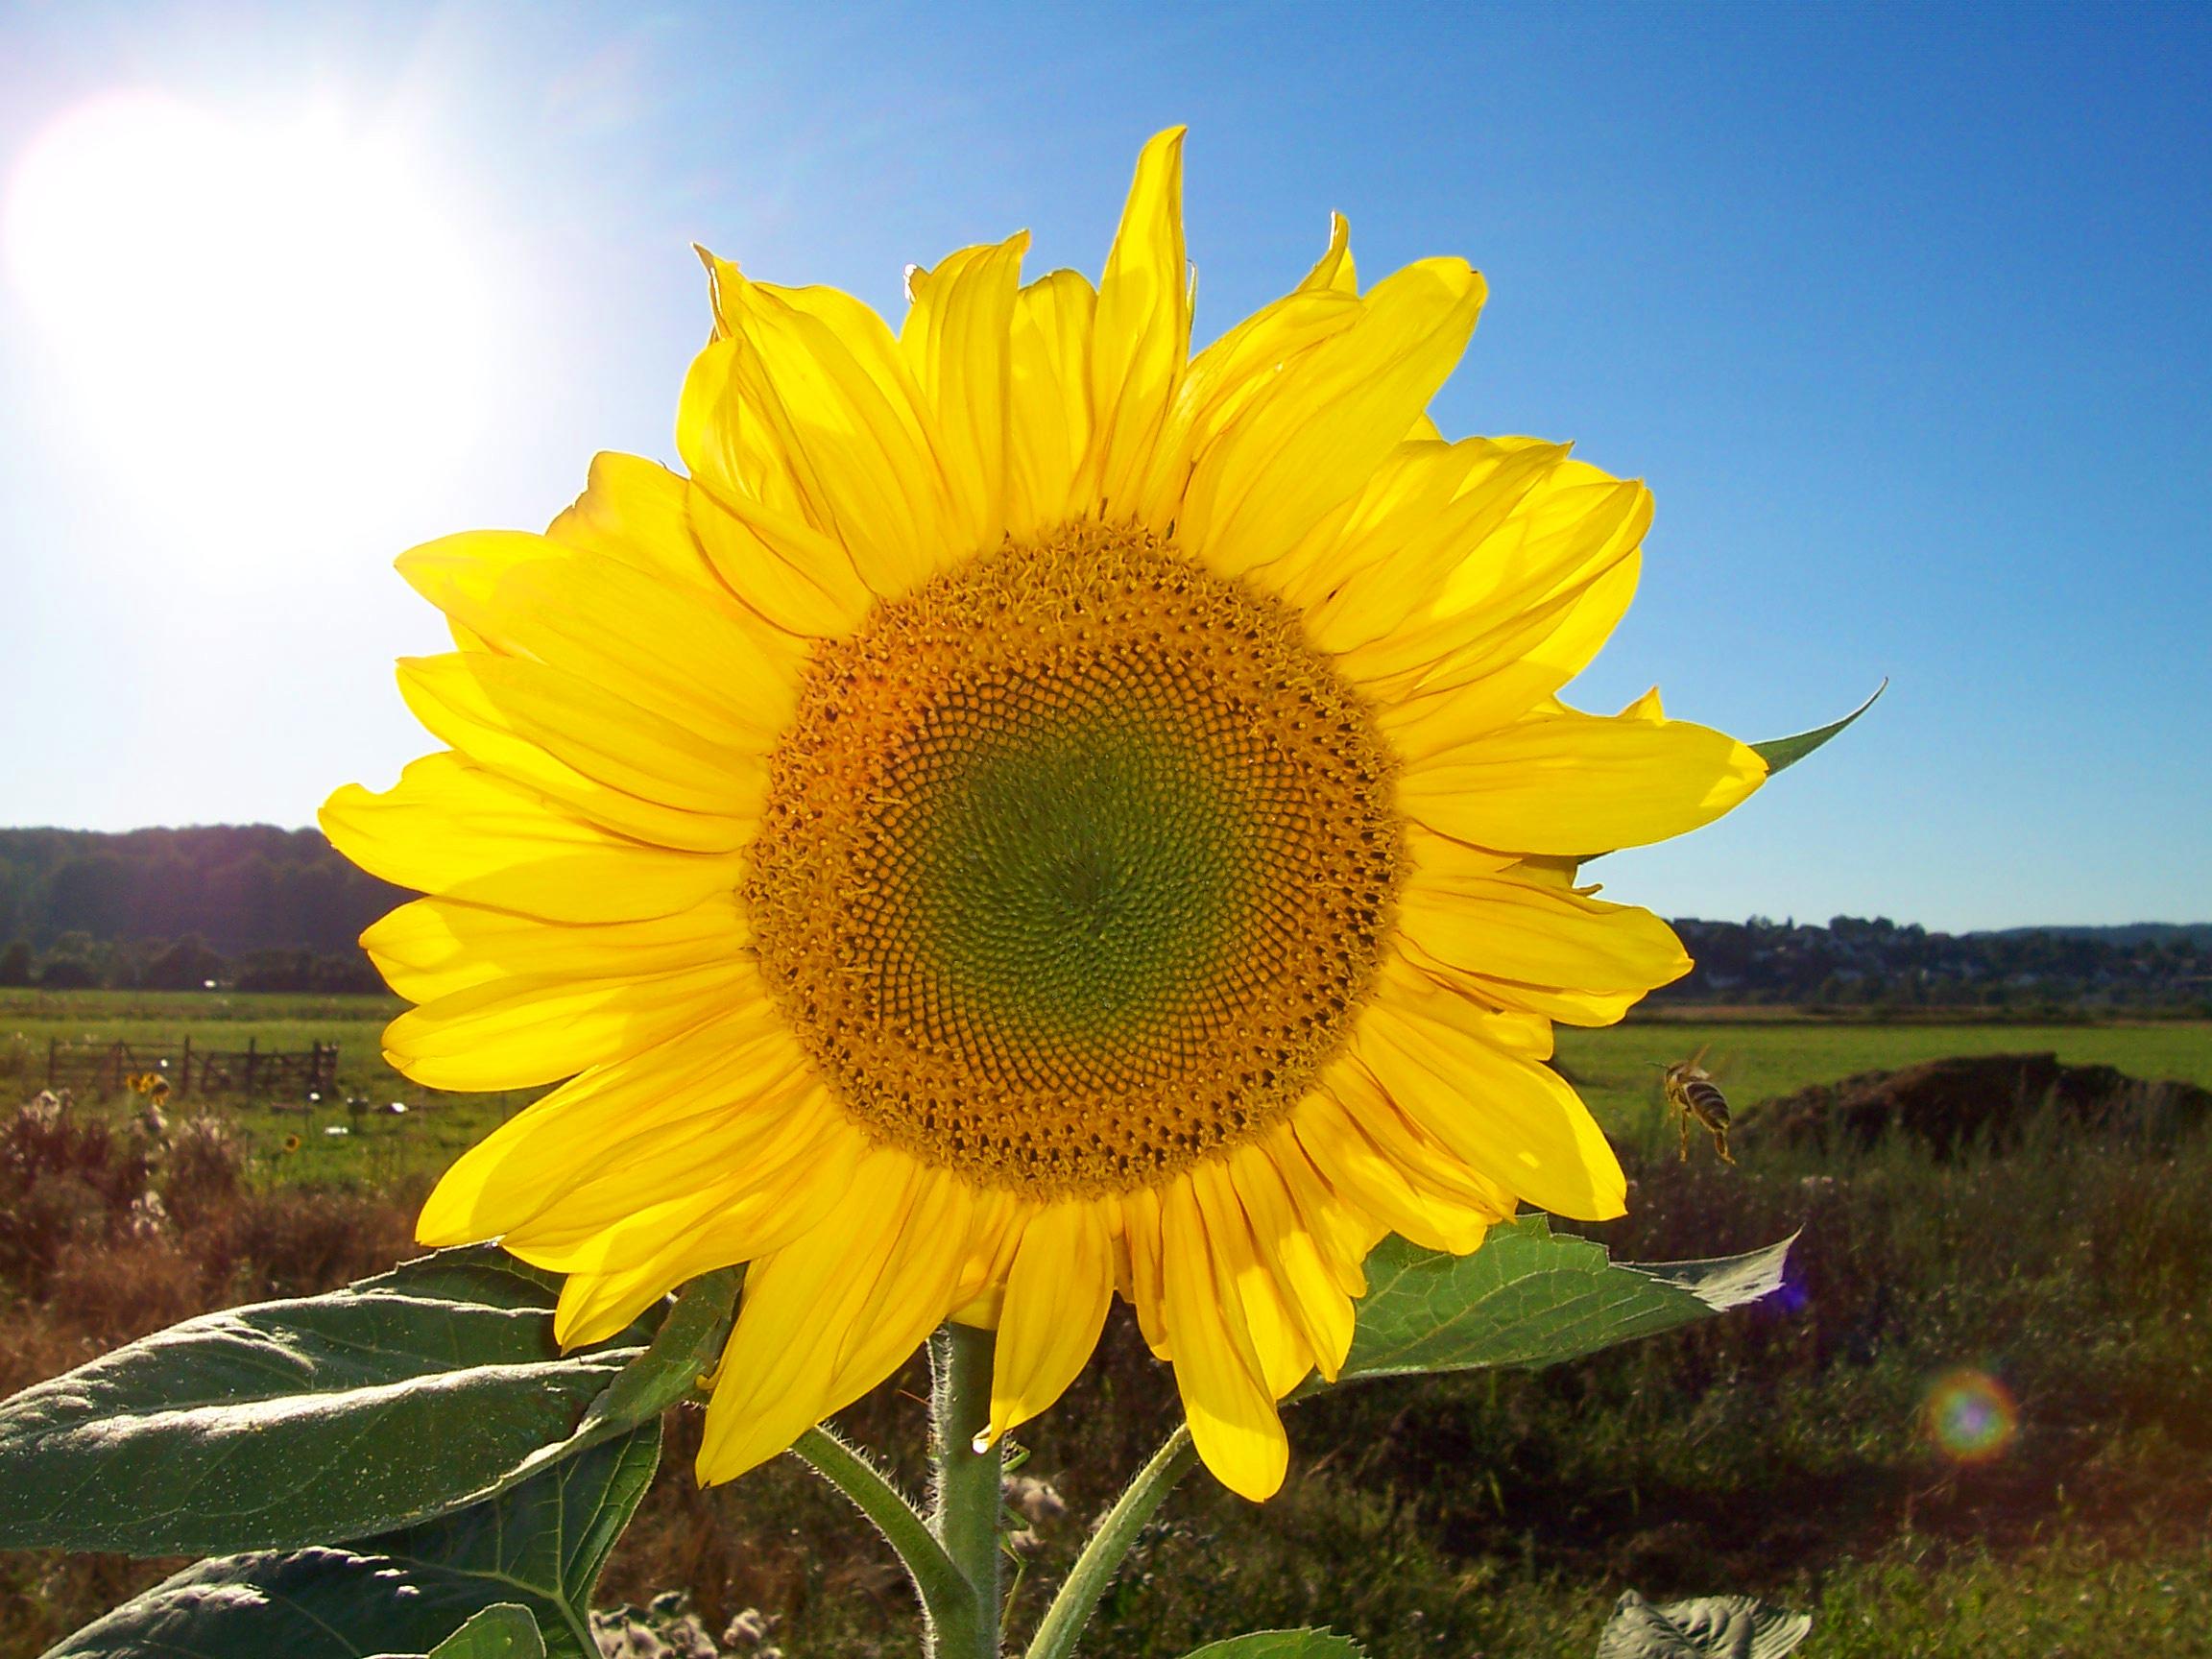 File:Sonnenblume.jpg - Wikimedia Commons